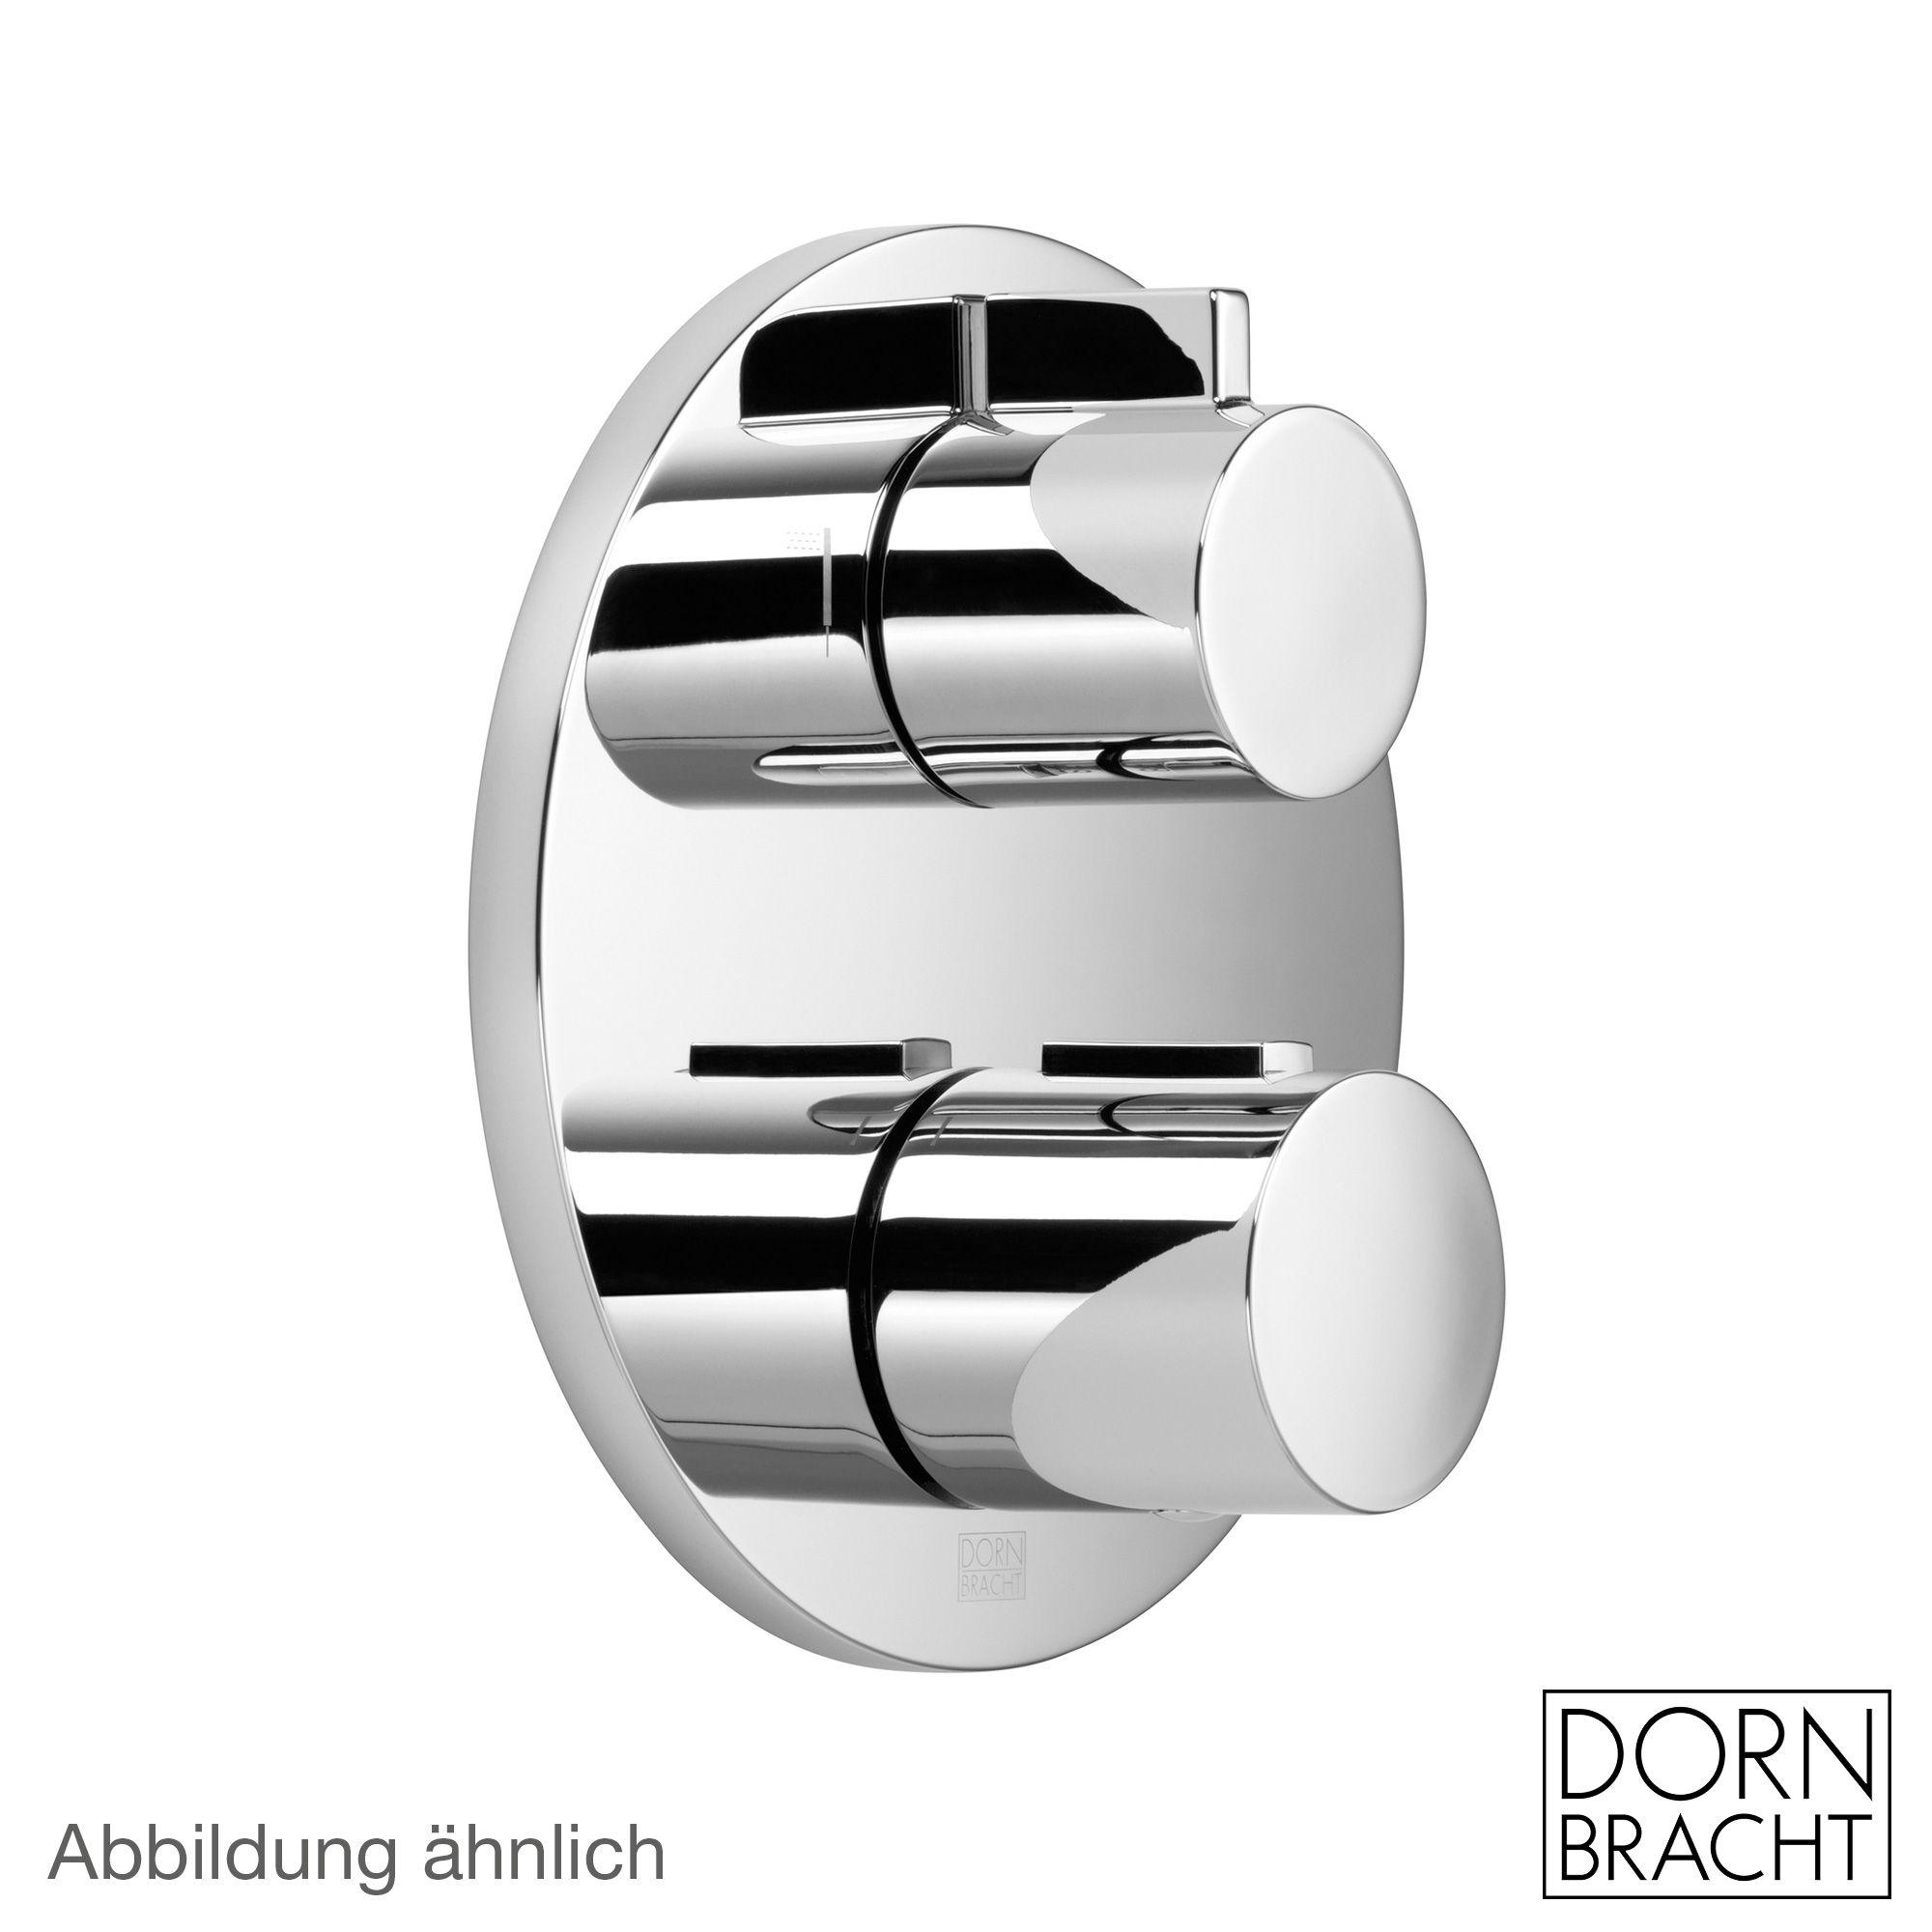 Dornbracht concealed thermostat with twoway volume